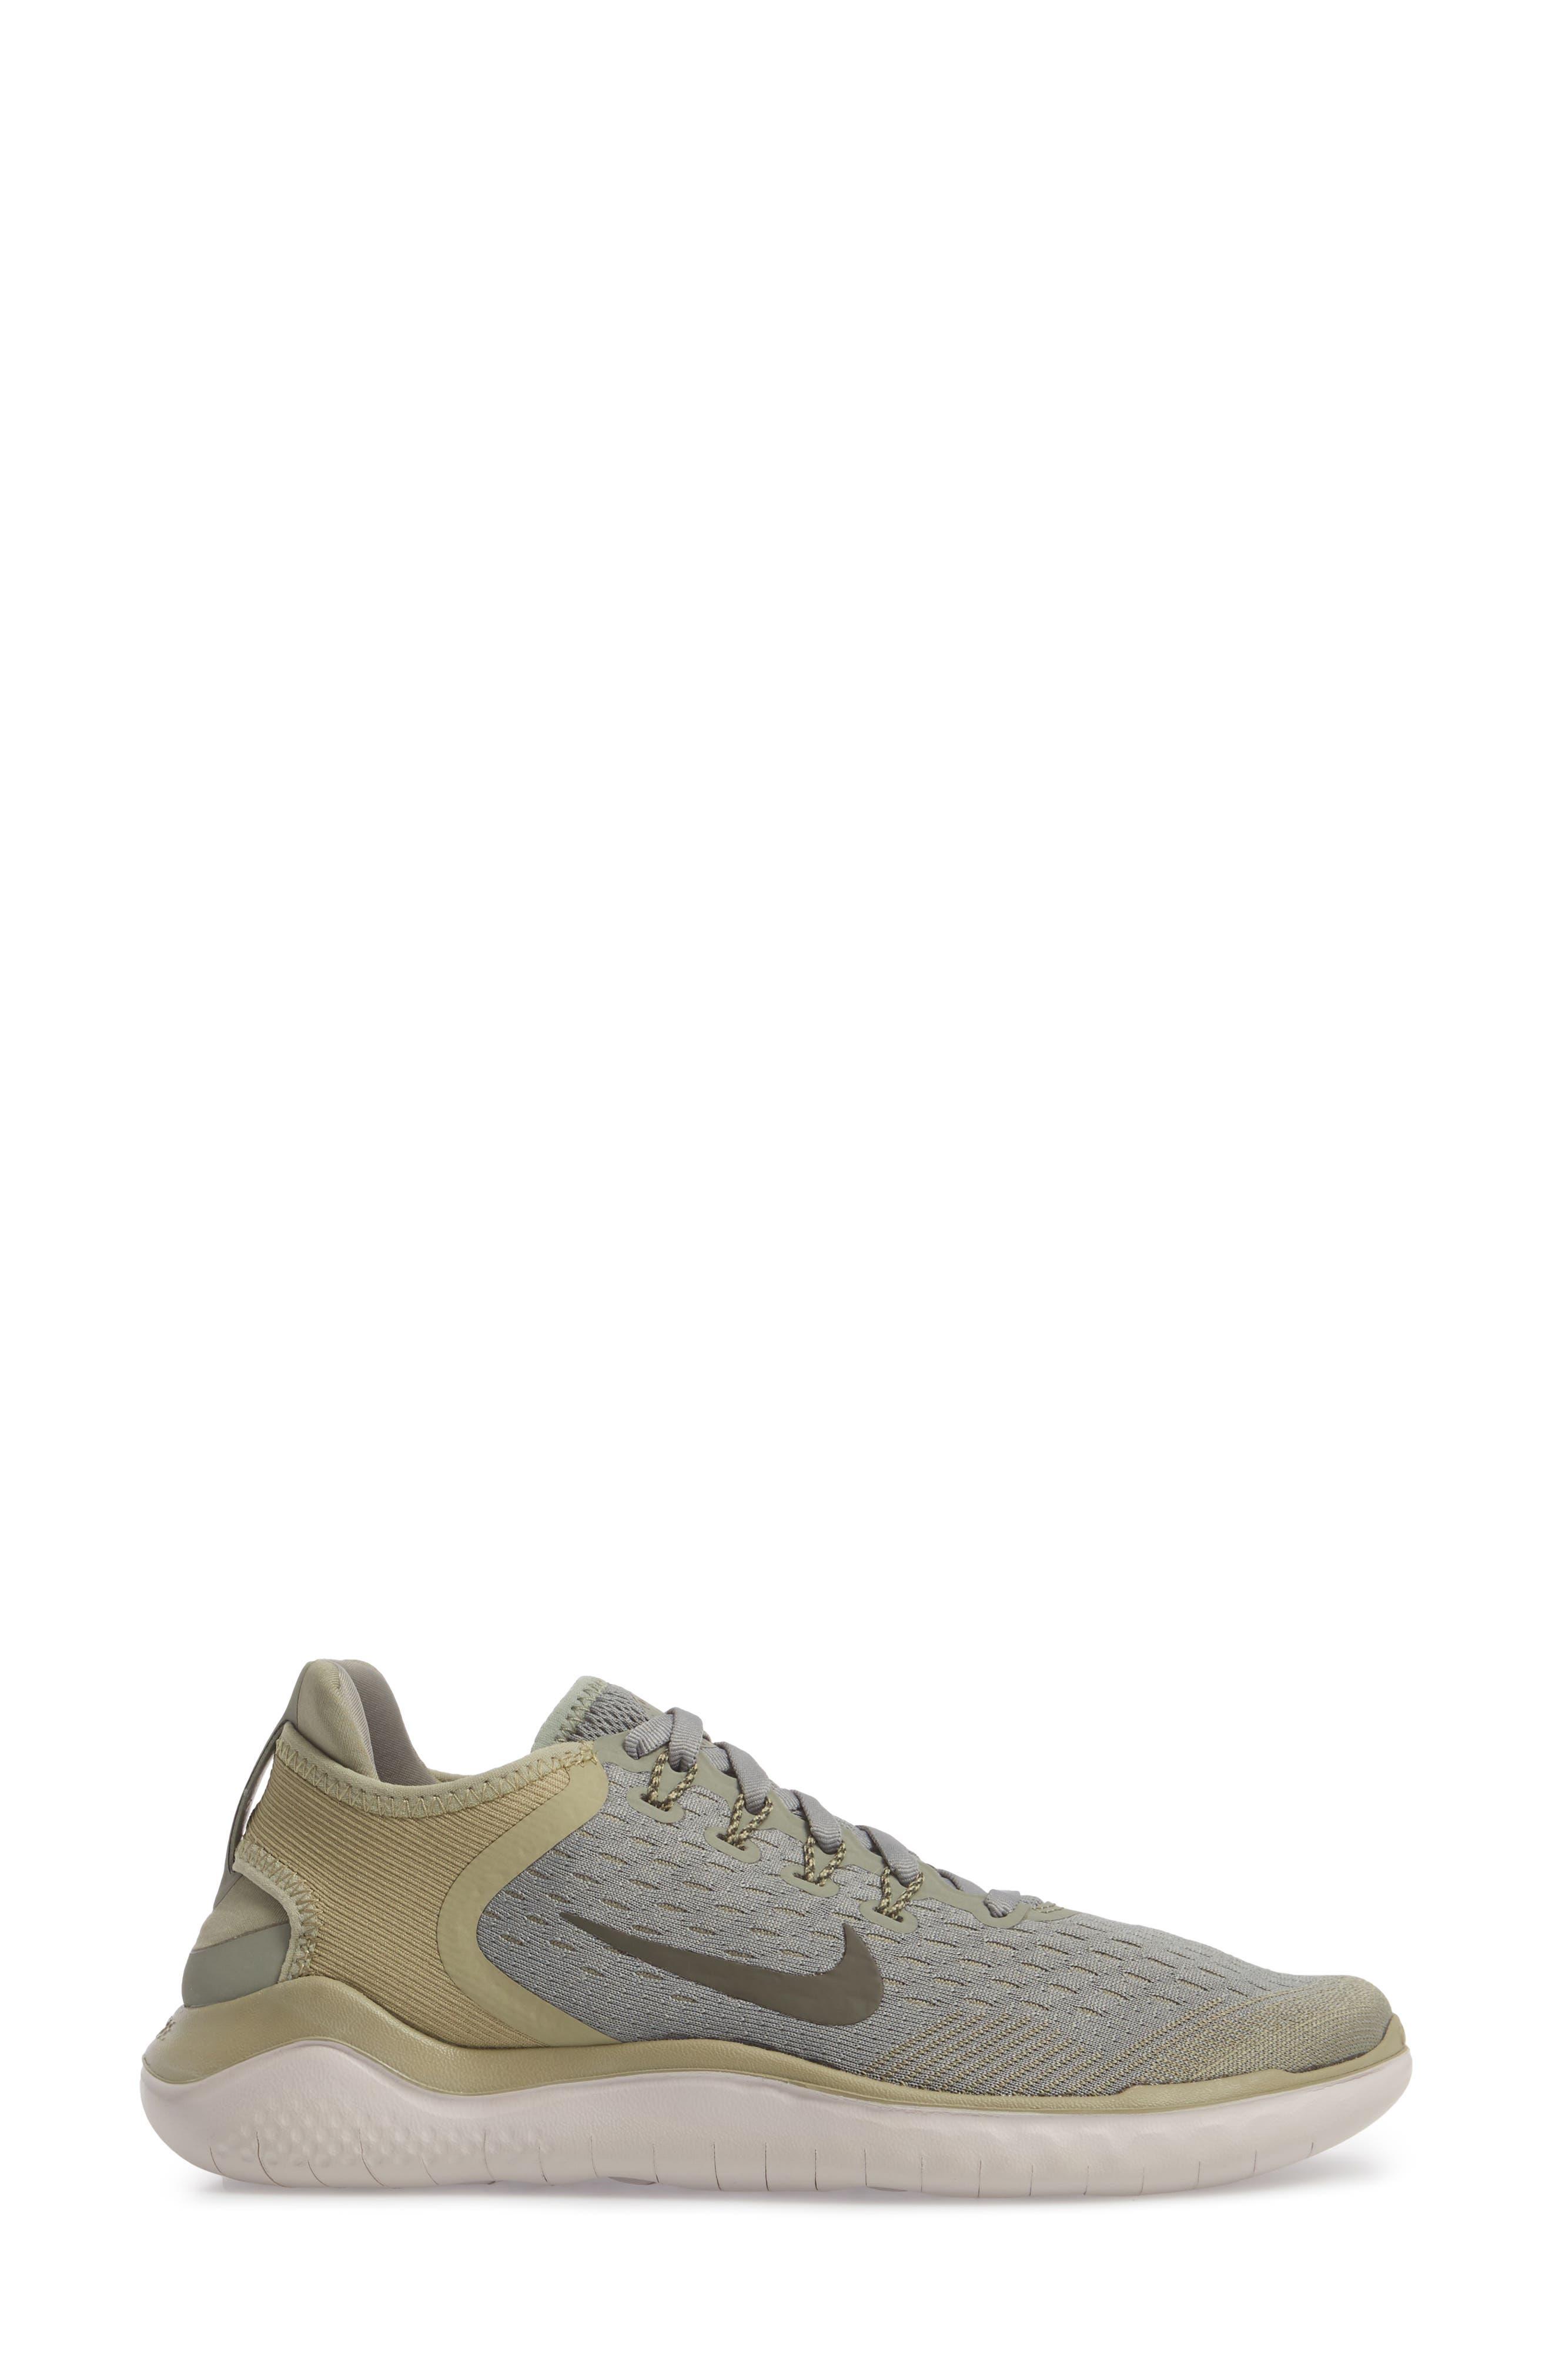 Free RN 2018 Running Shoe,                             Alternate thumbnail 3, color,                             Dark Stucco/ Cargo Khaki